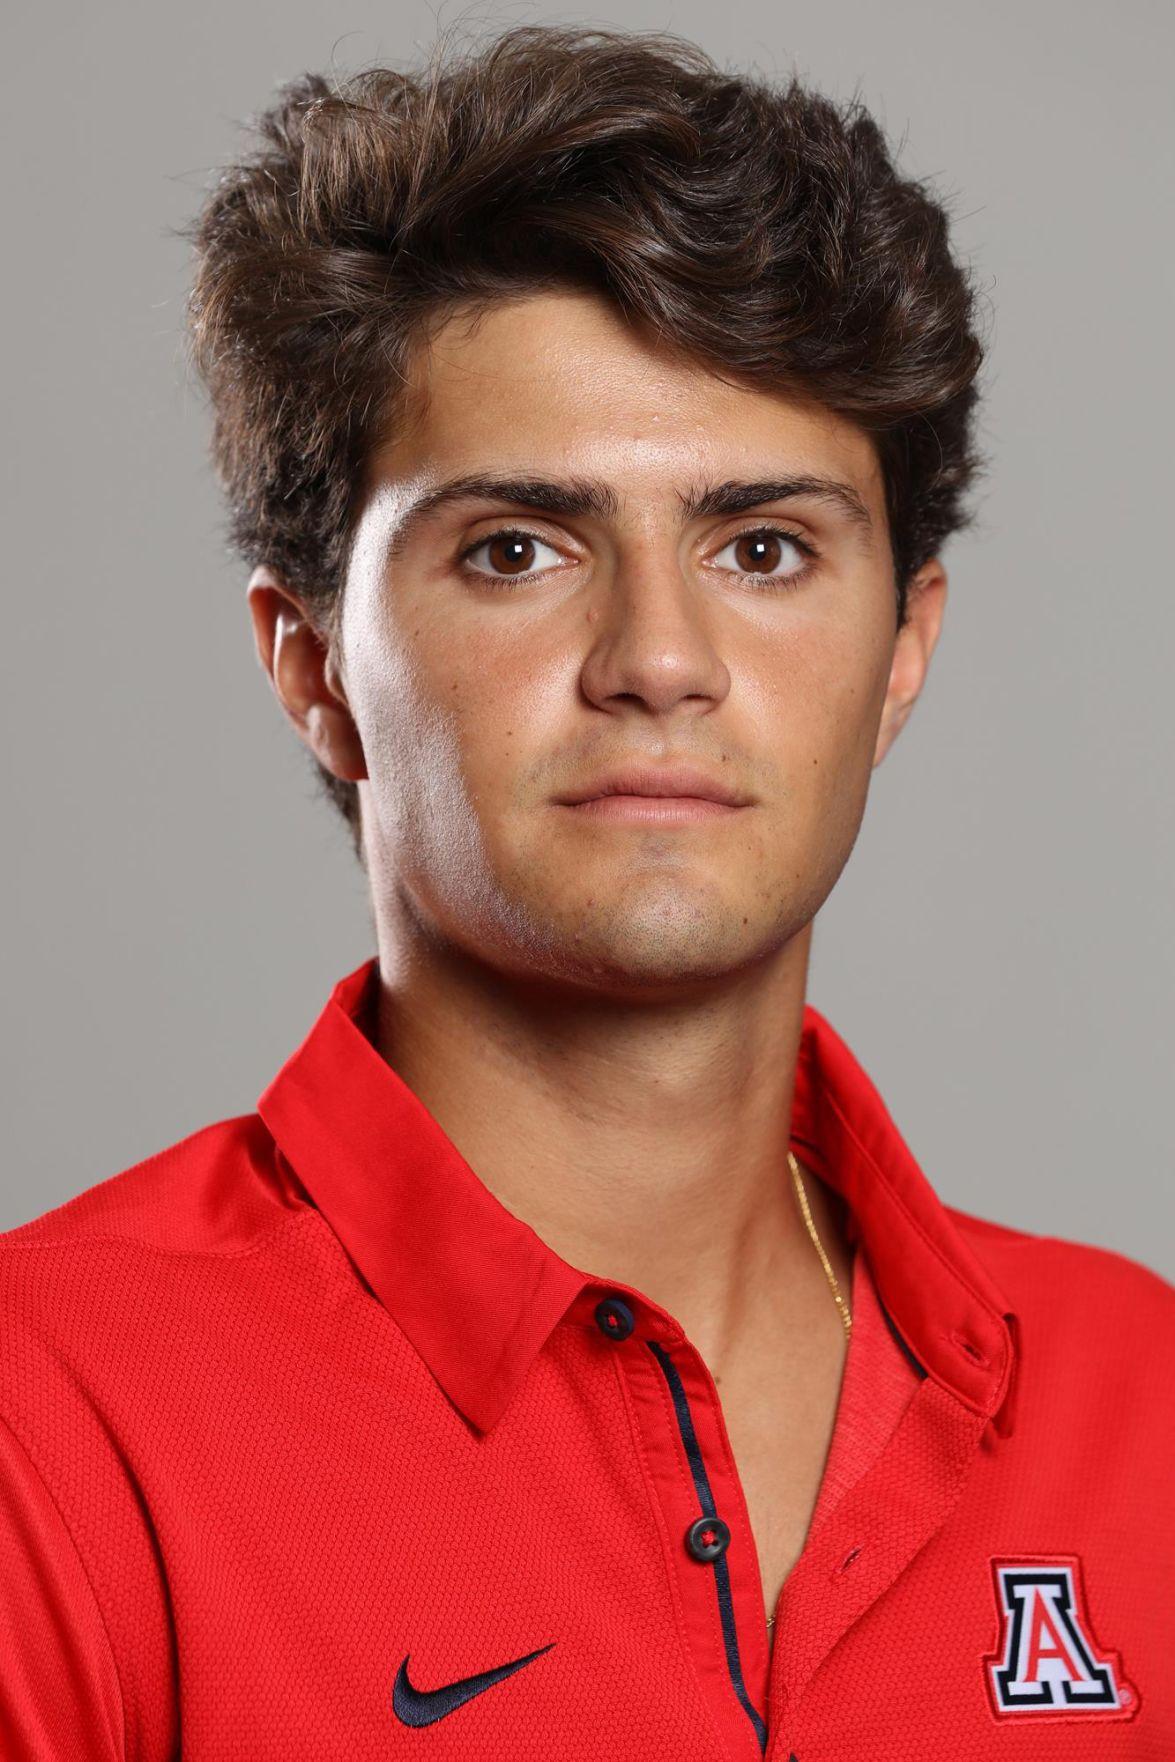 Alejandro Reguant